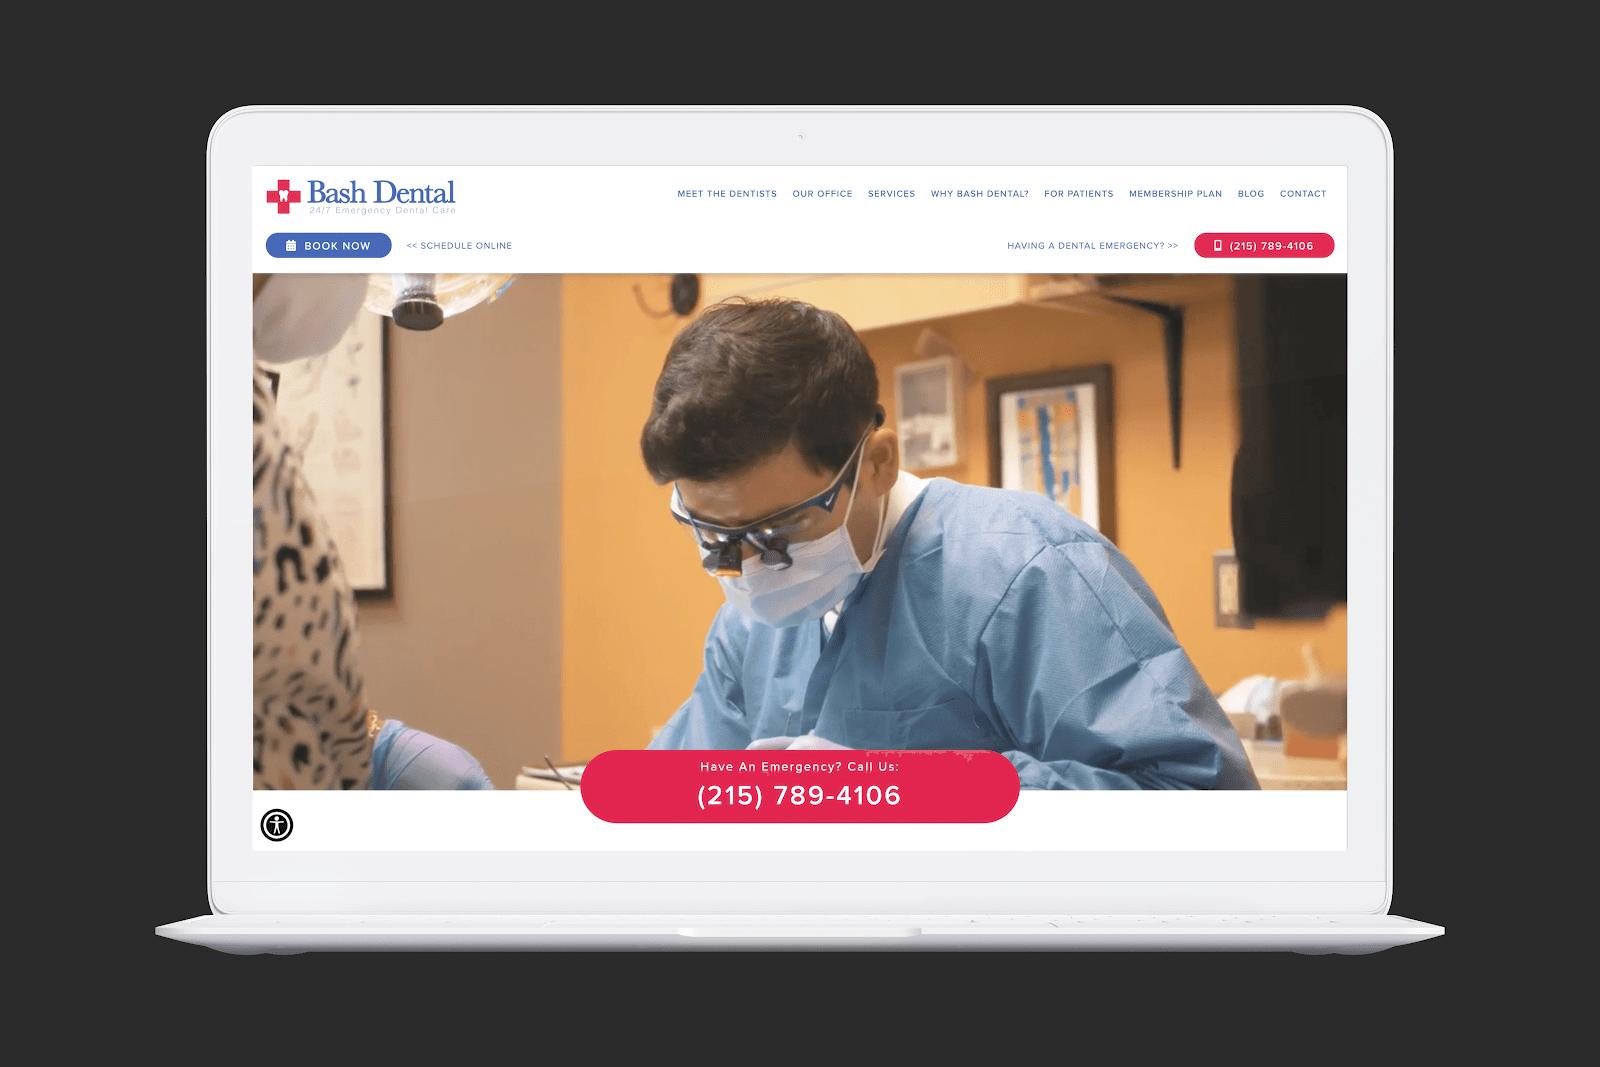 Bash Dental Homepage Screengrab